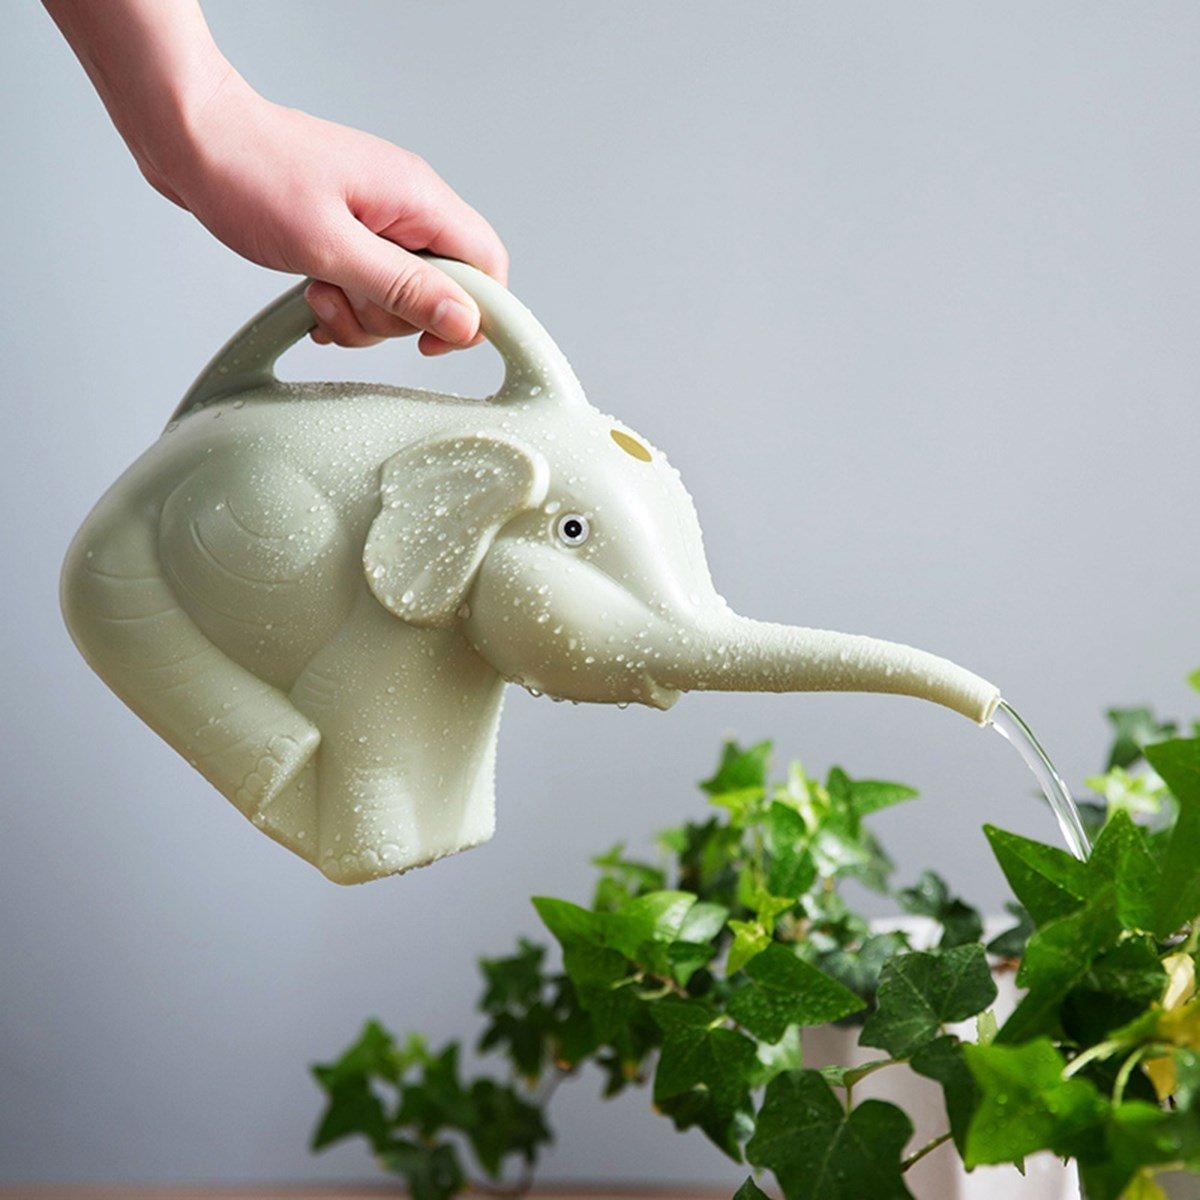 SaveStore Garden Plastic Elephant Watering Can 2 Quart 1/2 Gallon Home Patio Lawn Gardening Tool Plant Outdoor Irrigation Watering Pot Jug